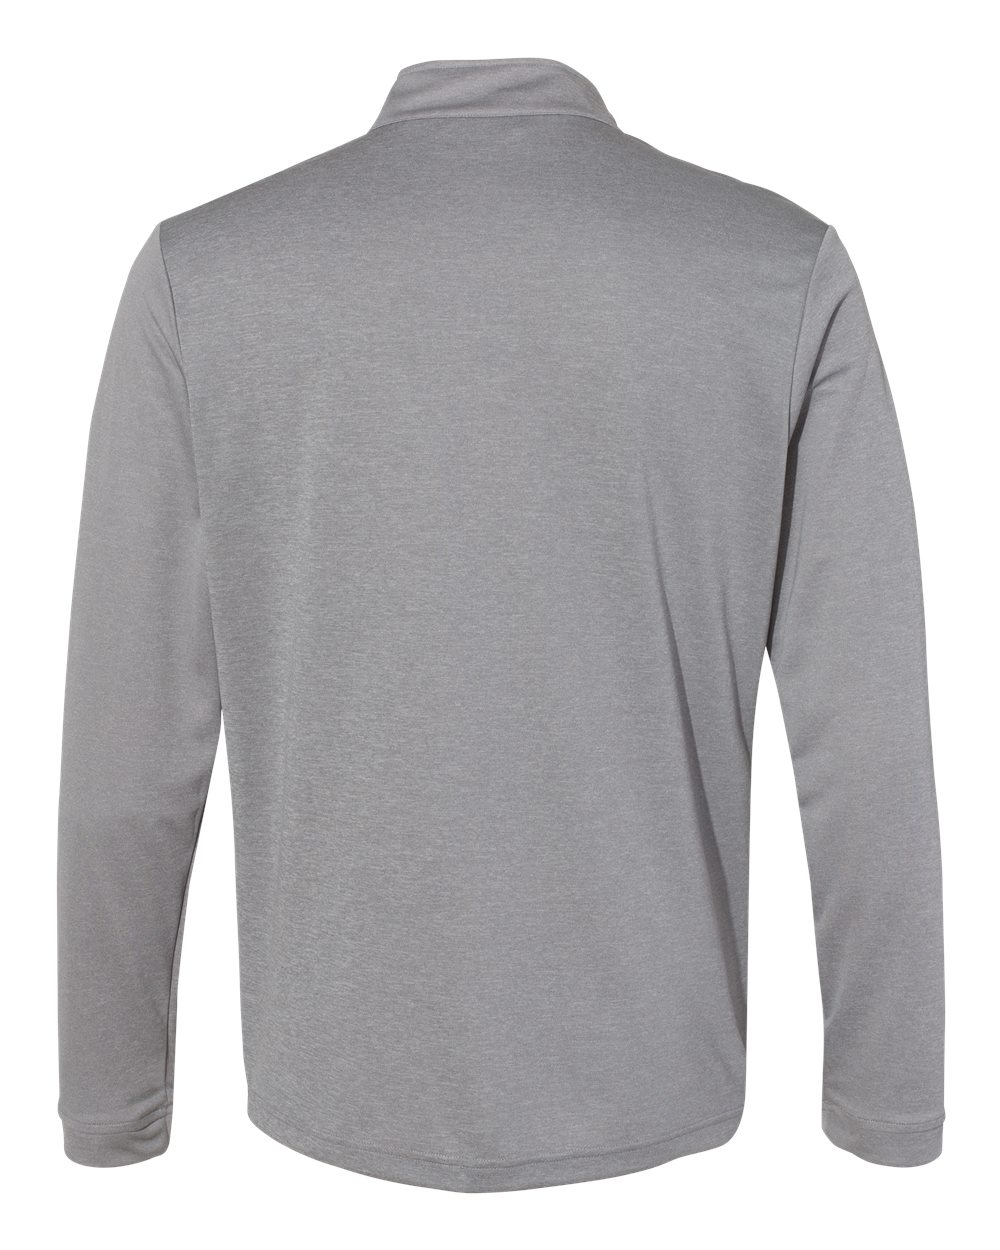 Adidas-Mens-Lightweight-UPF-pullover-Shirt-Warmup-A280-up-to-4XL thumbnail 16